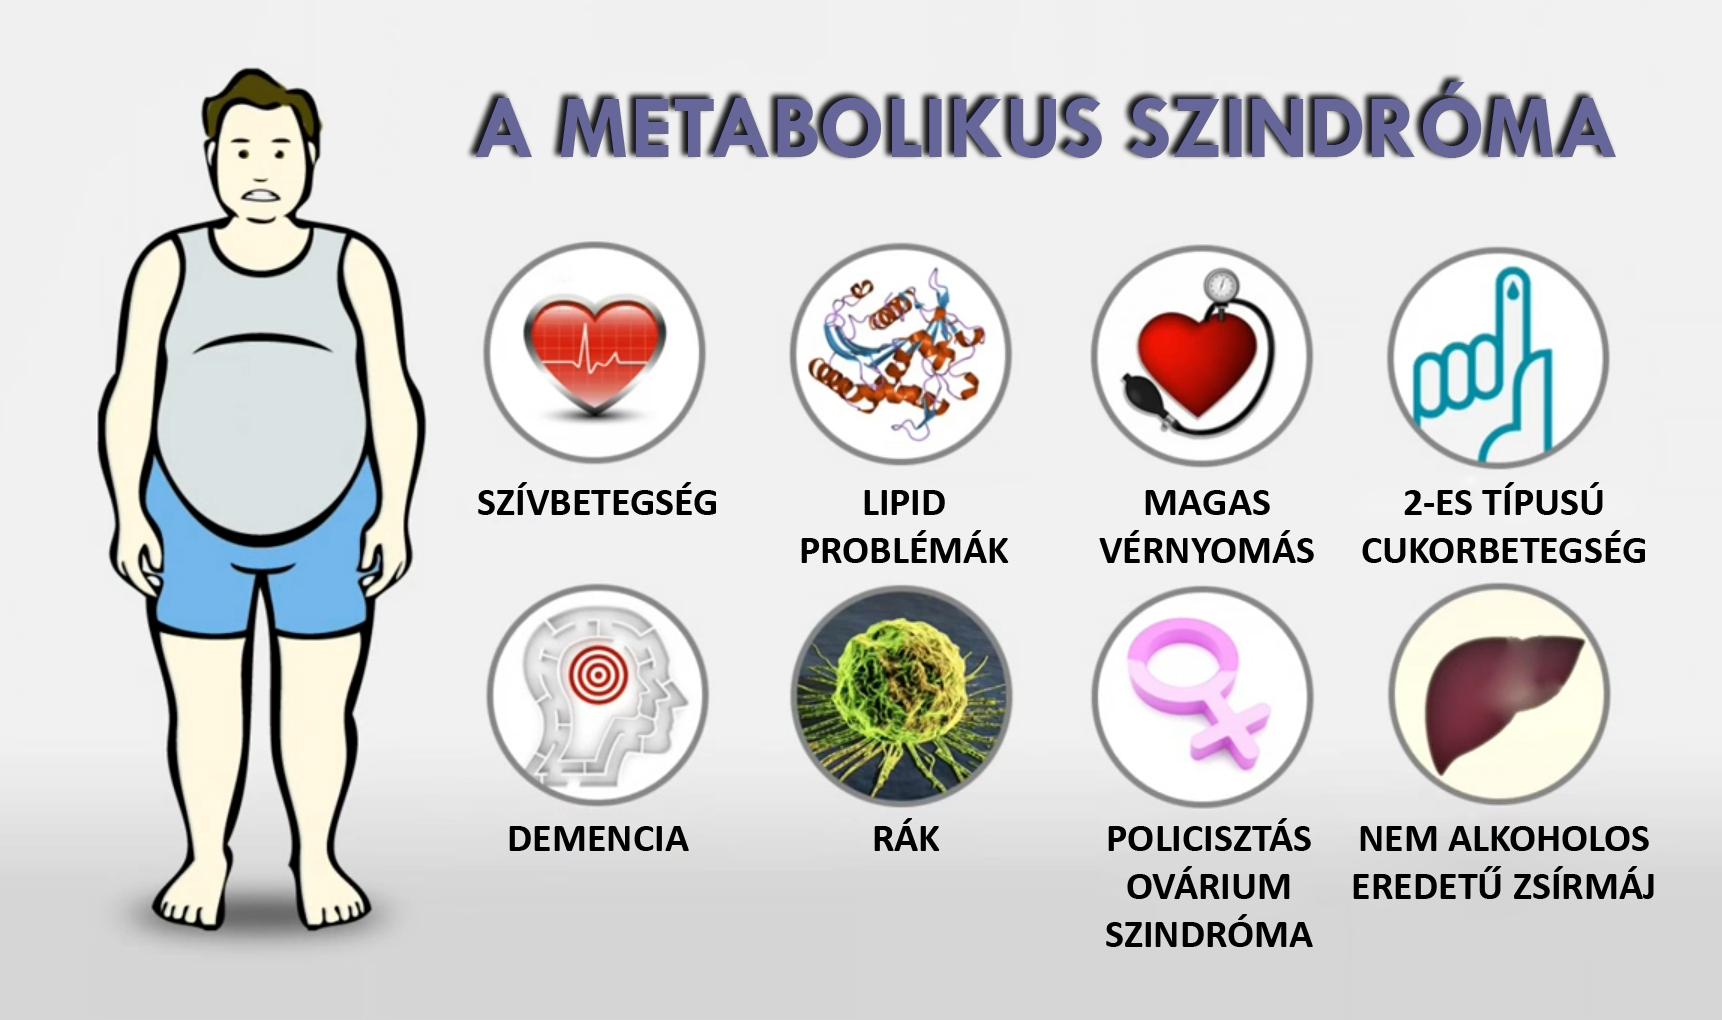 magas vérnyomás metabolikus szindróma)